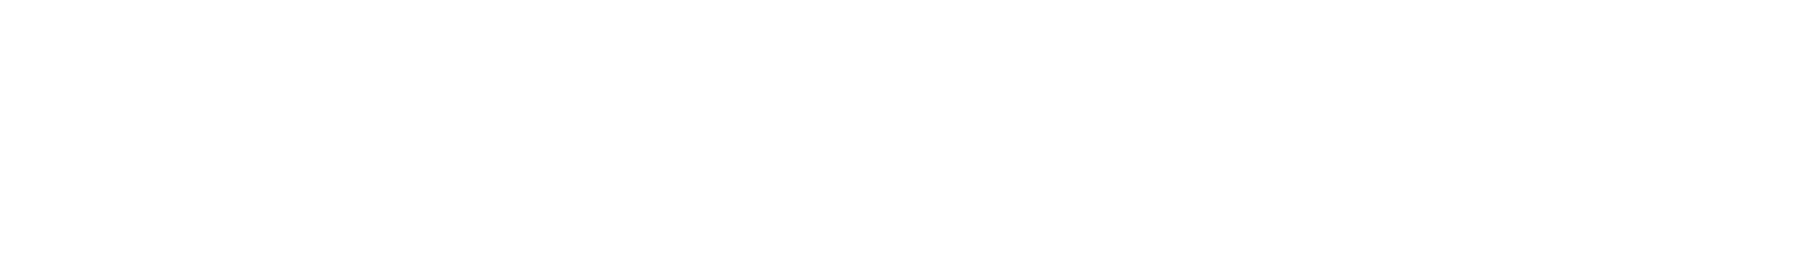 synth choir dm